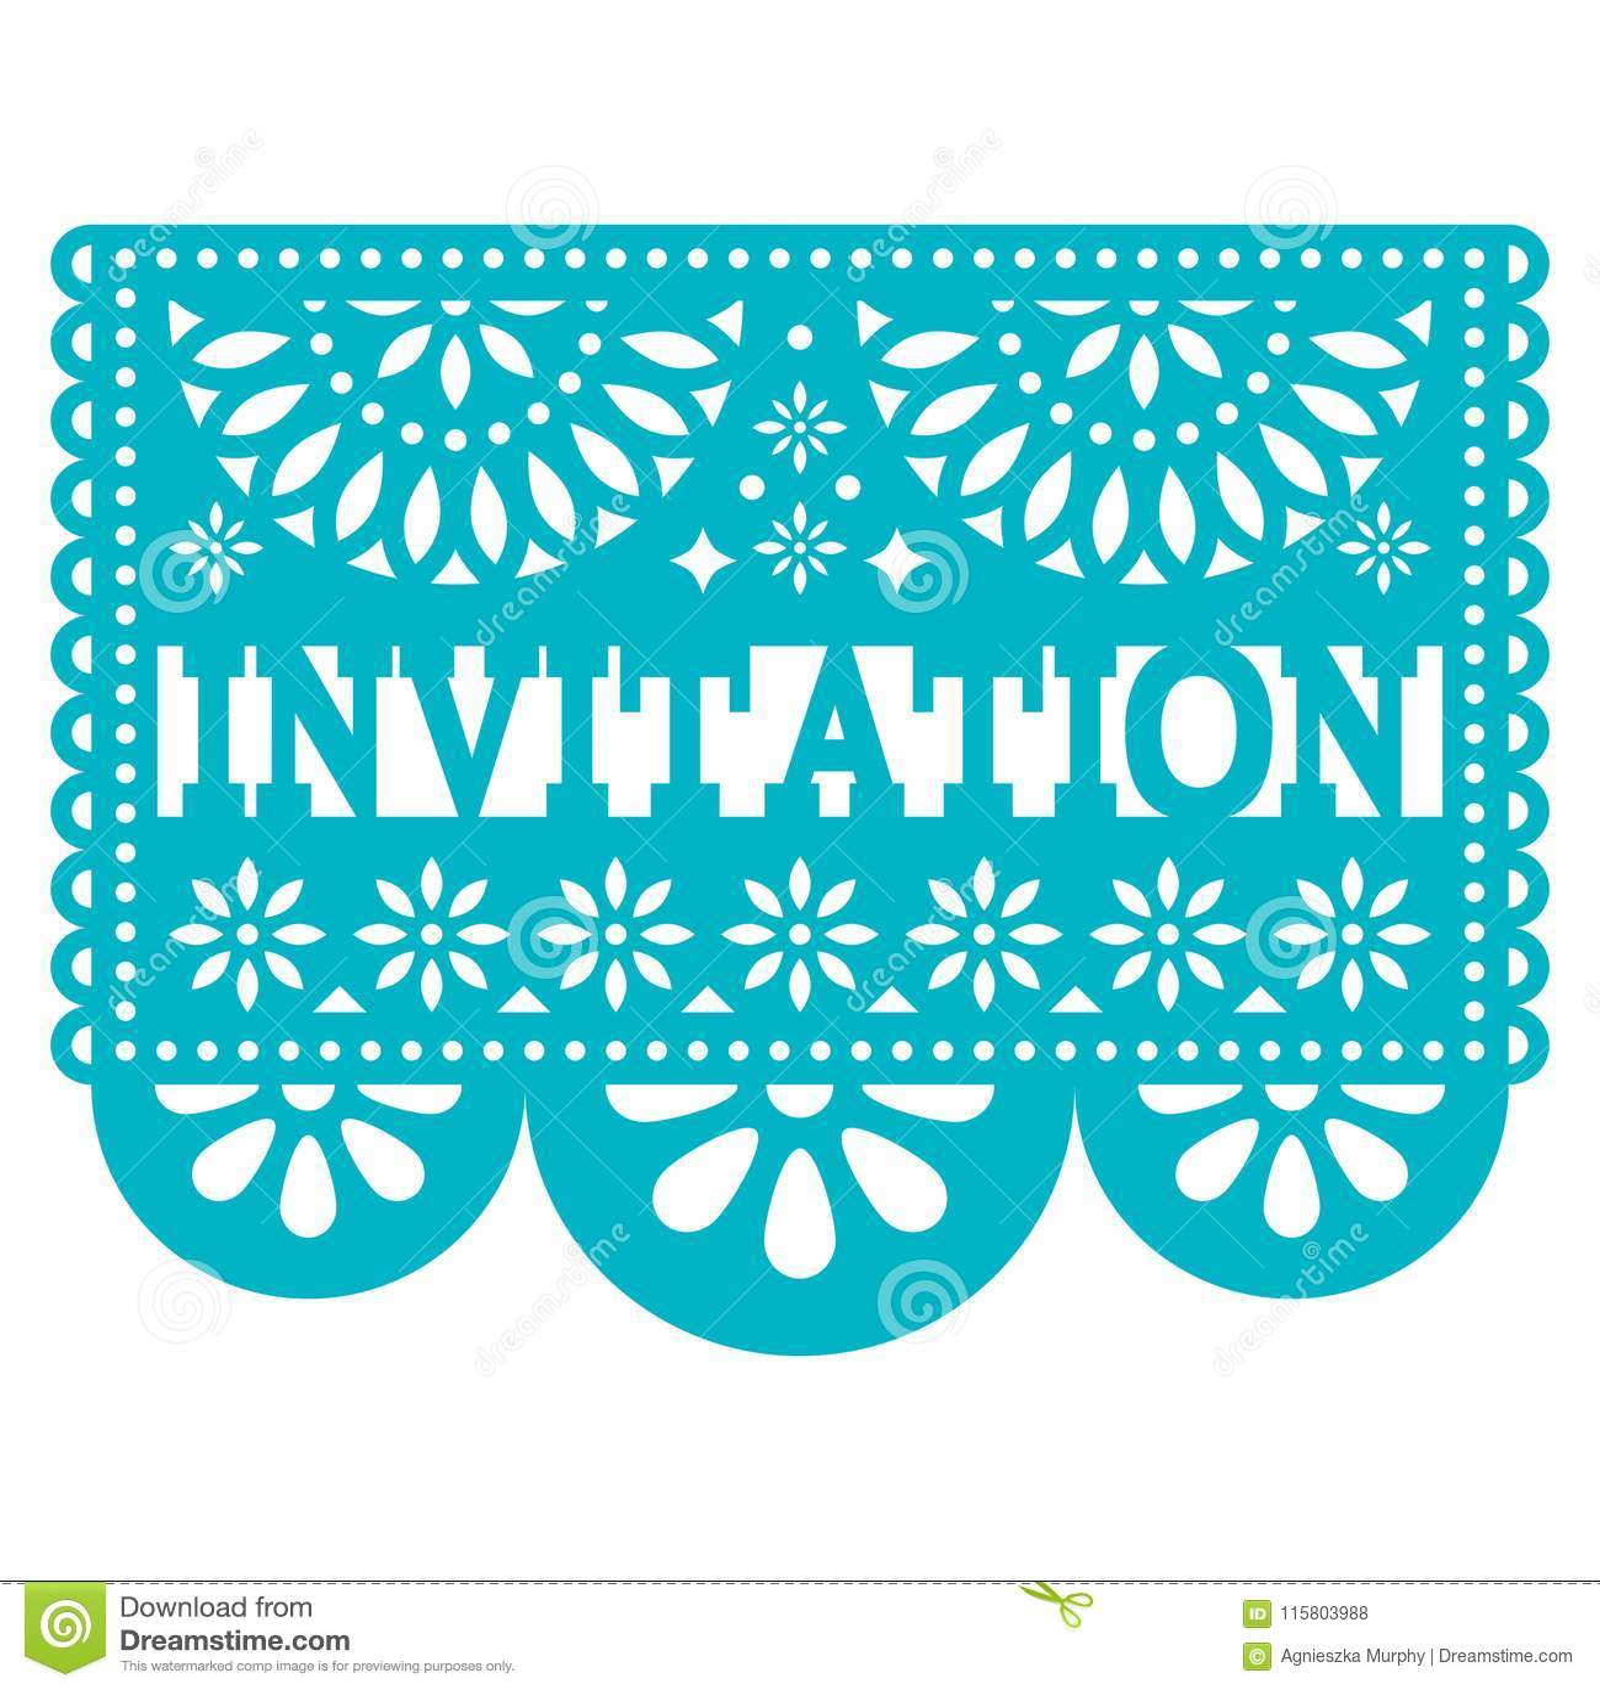 Invitation Papel Picado Vector Design Party Greeting Card Mexican